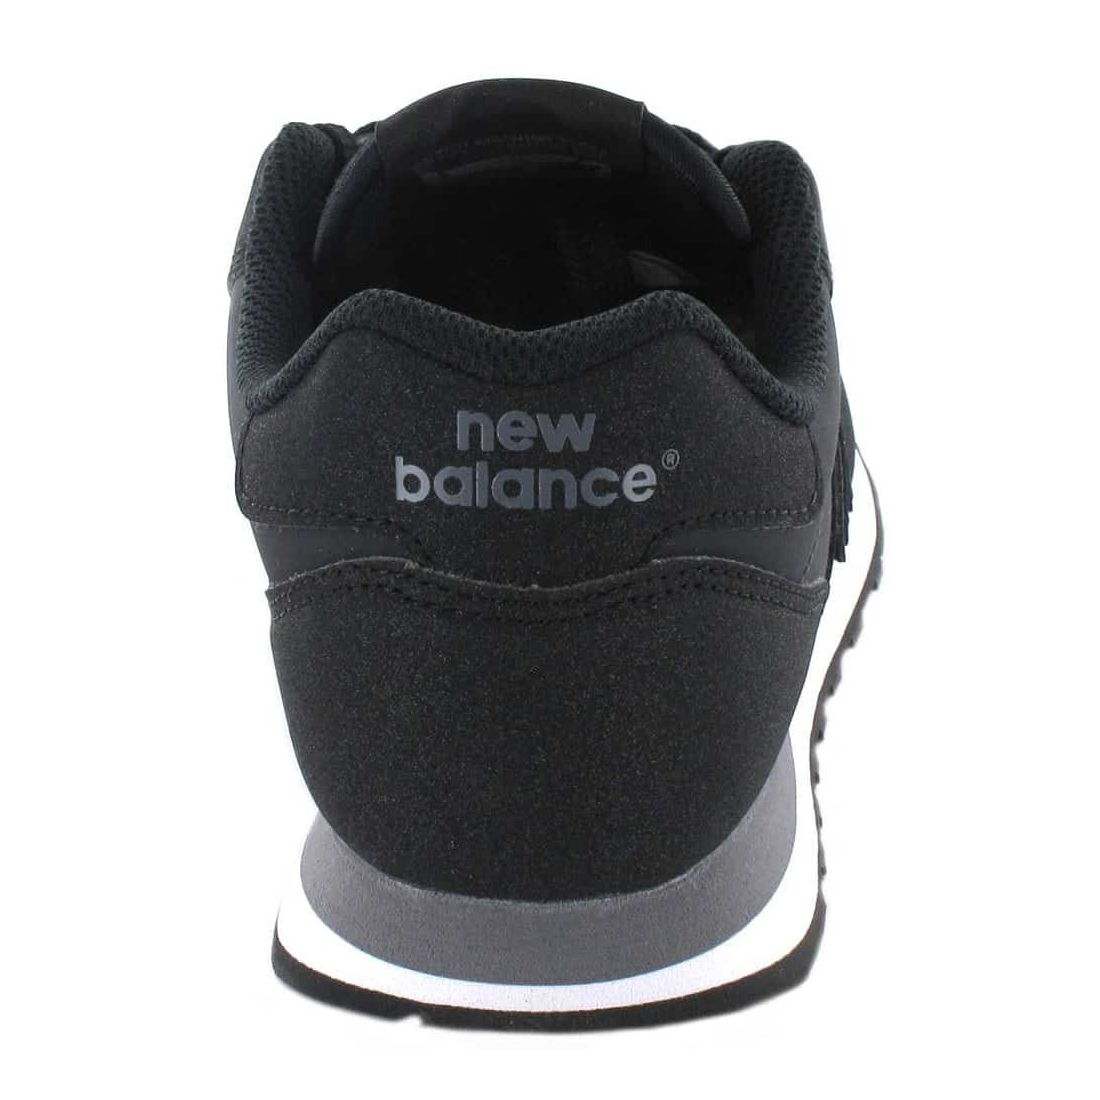 New Balance GW500SMB New Balance Calzado Casual Mujer Lifestyle Tallas: 37, 37,5, 38, 39, 40, 40,5, 41; Color: negro